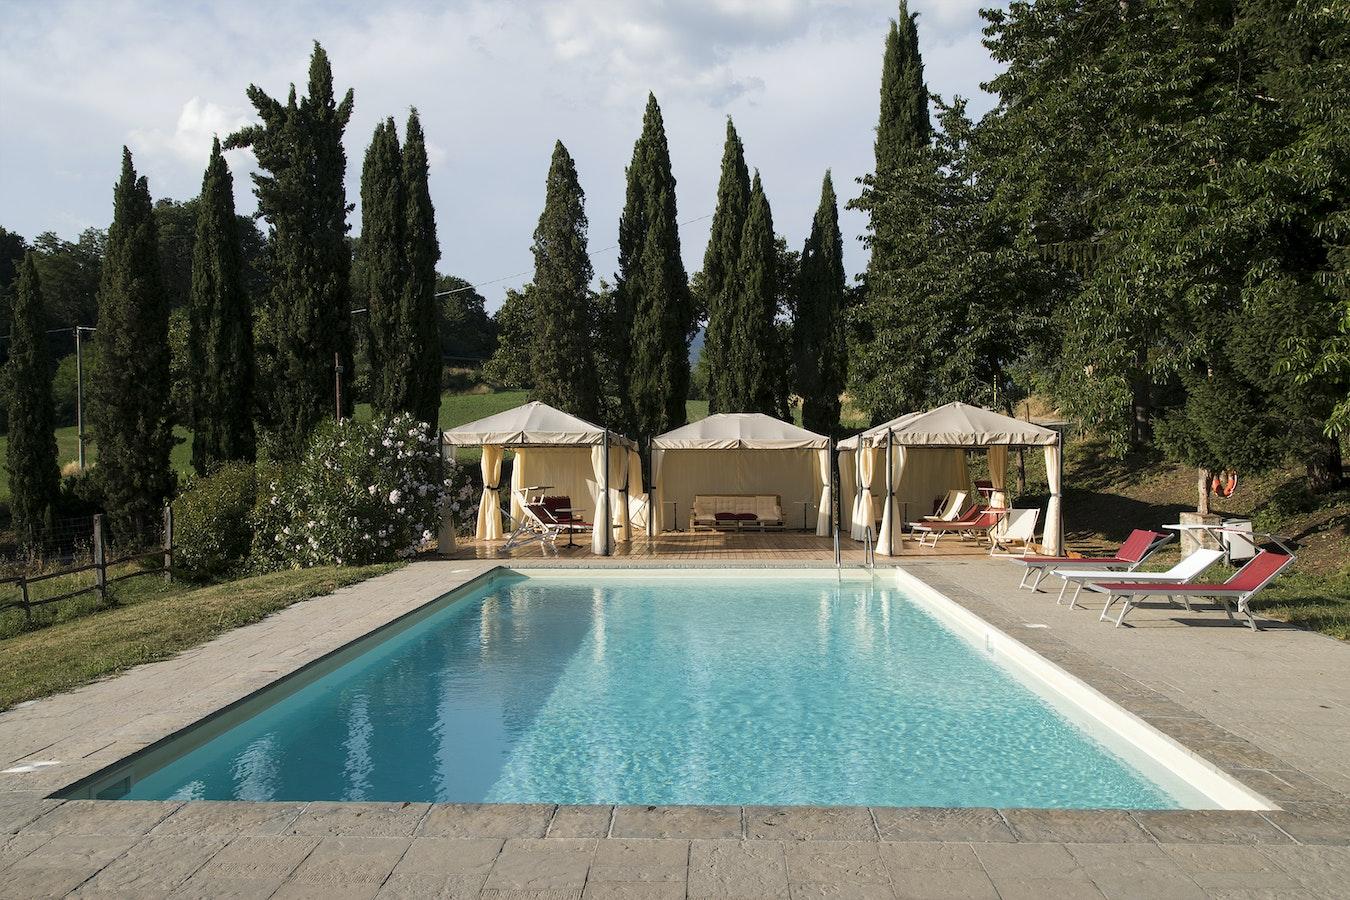 Agriturismo la topaia borgo san lorenzo mugello - Agriturismo firenze con piscina ...